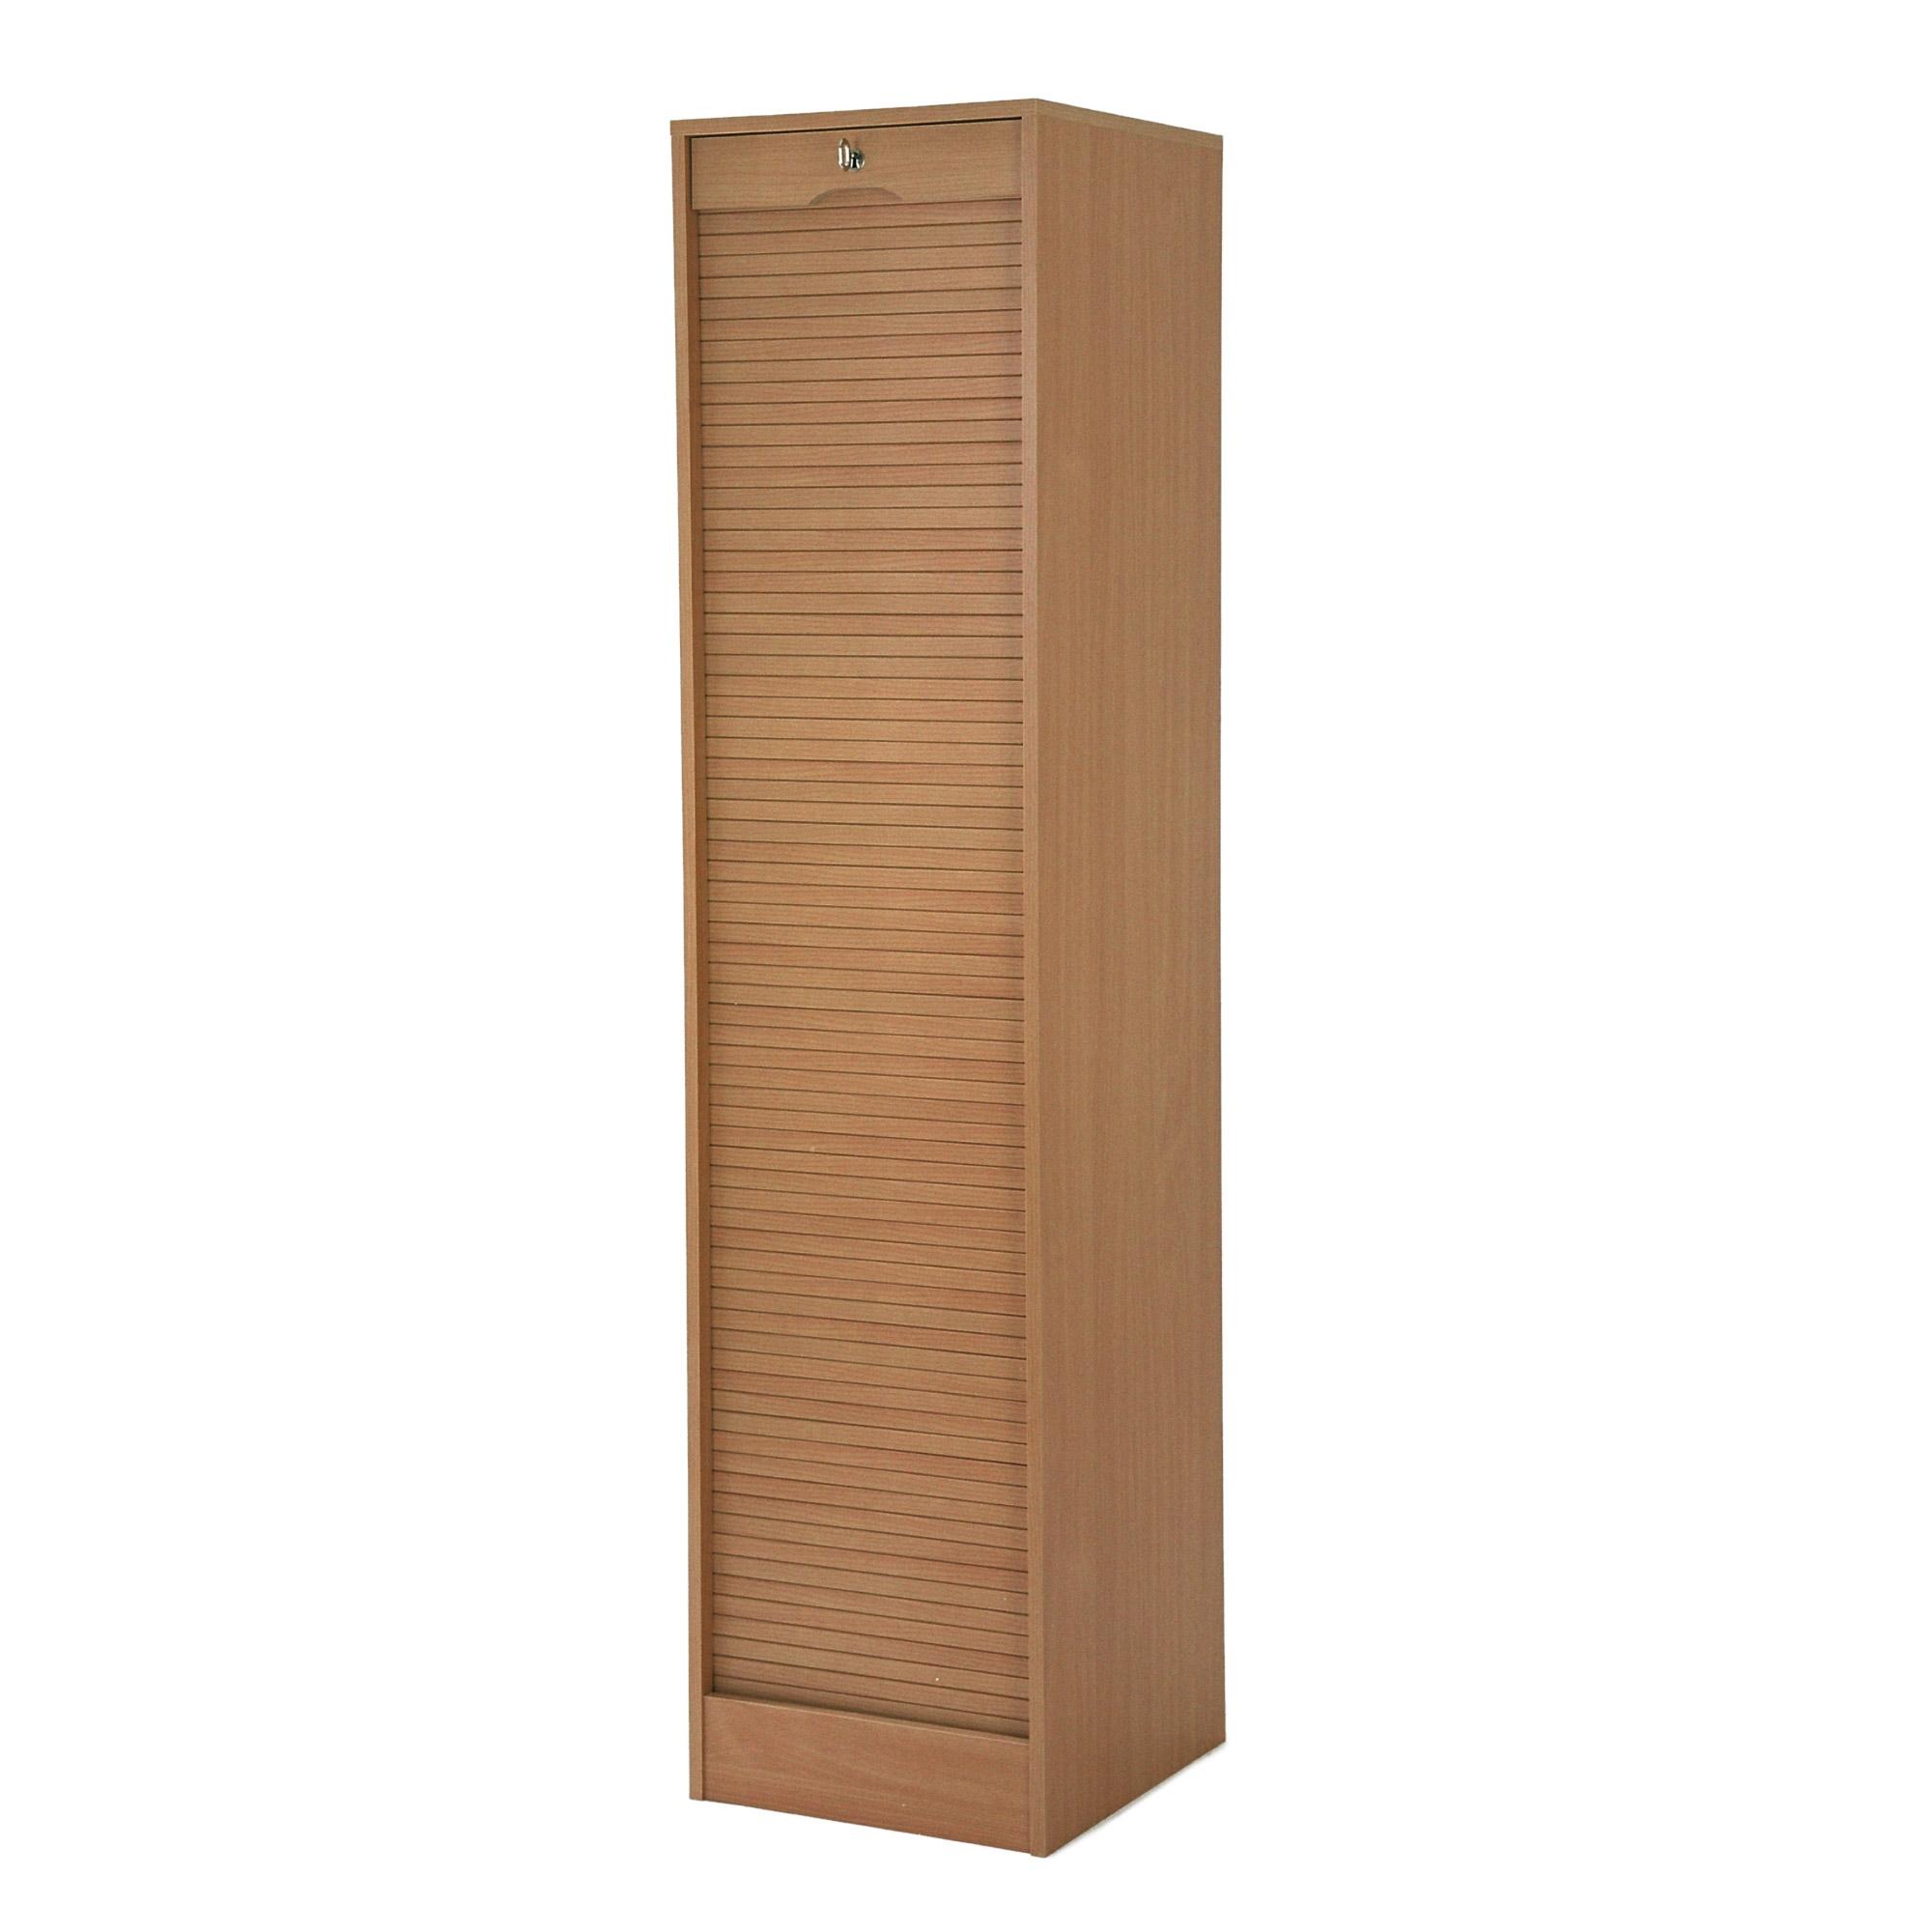 classeur h tre rideau h 172 cm matha. Black Bedroom Furniture Sets. Home Design Ideas